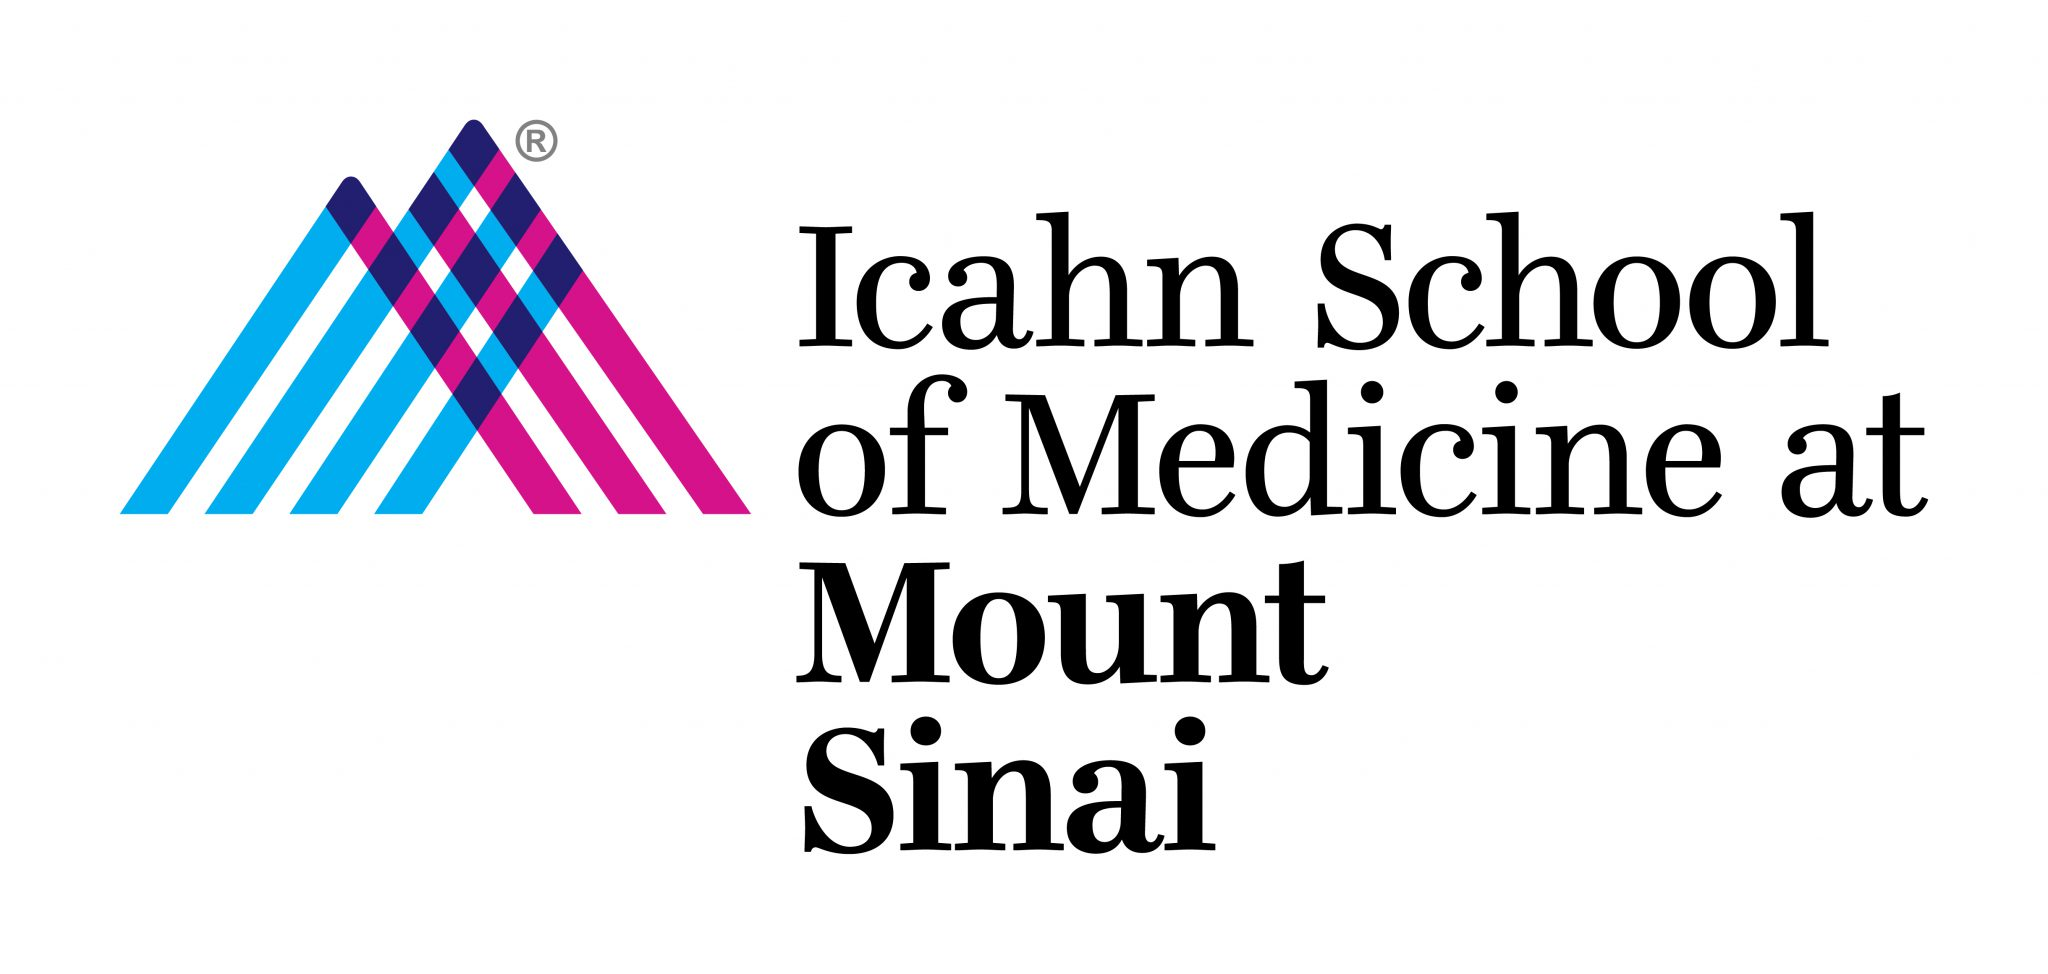 Icahn School of Medicine at Mount Sinai Secondary Essay